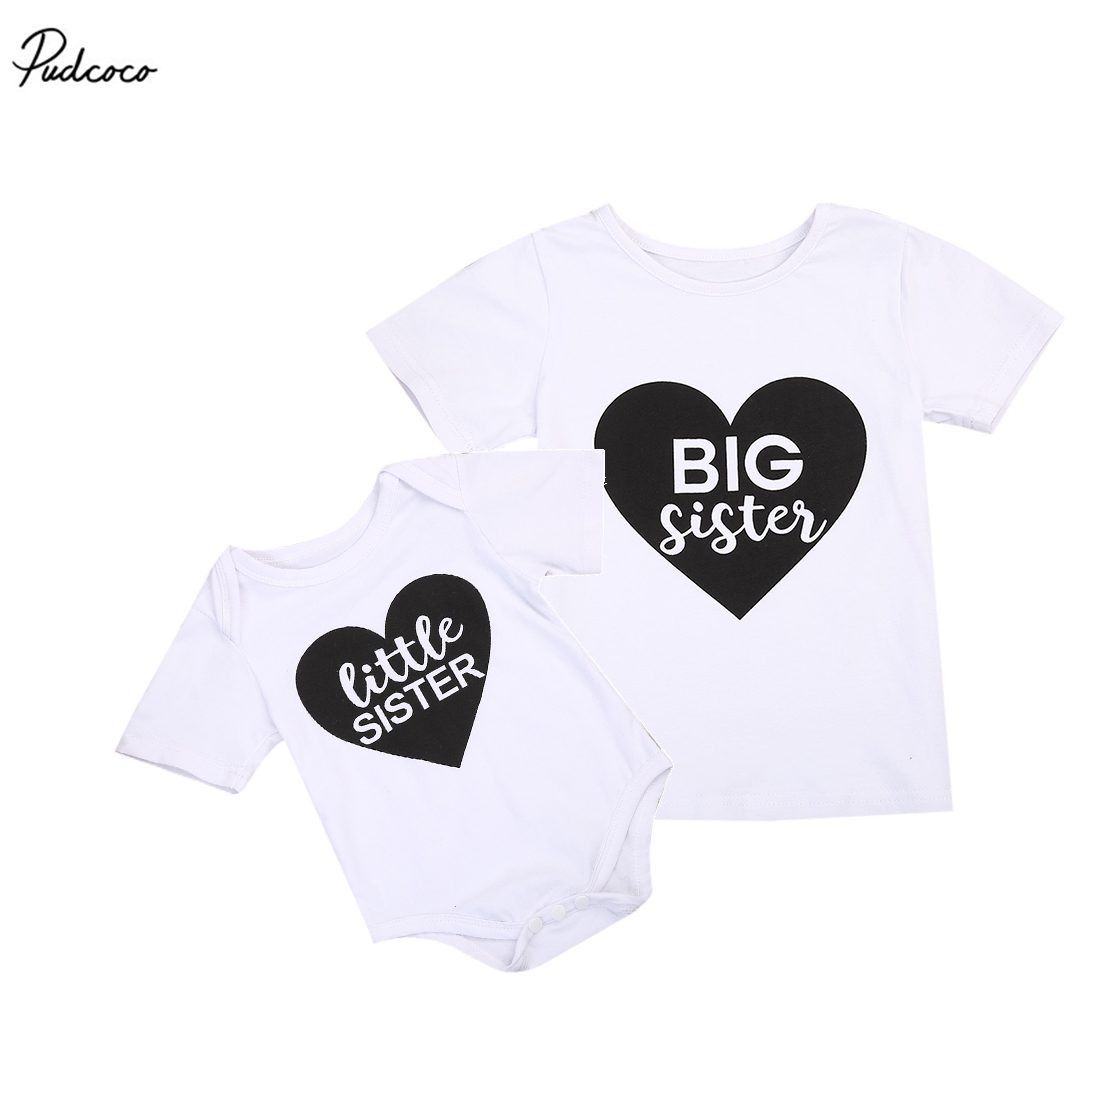 Baby Kids Girl Littler Big Sister Casual Cotton Short Sleeve Romper Heart Jumpsuit 2017 New Summer Tops Family Set